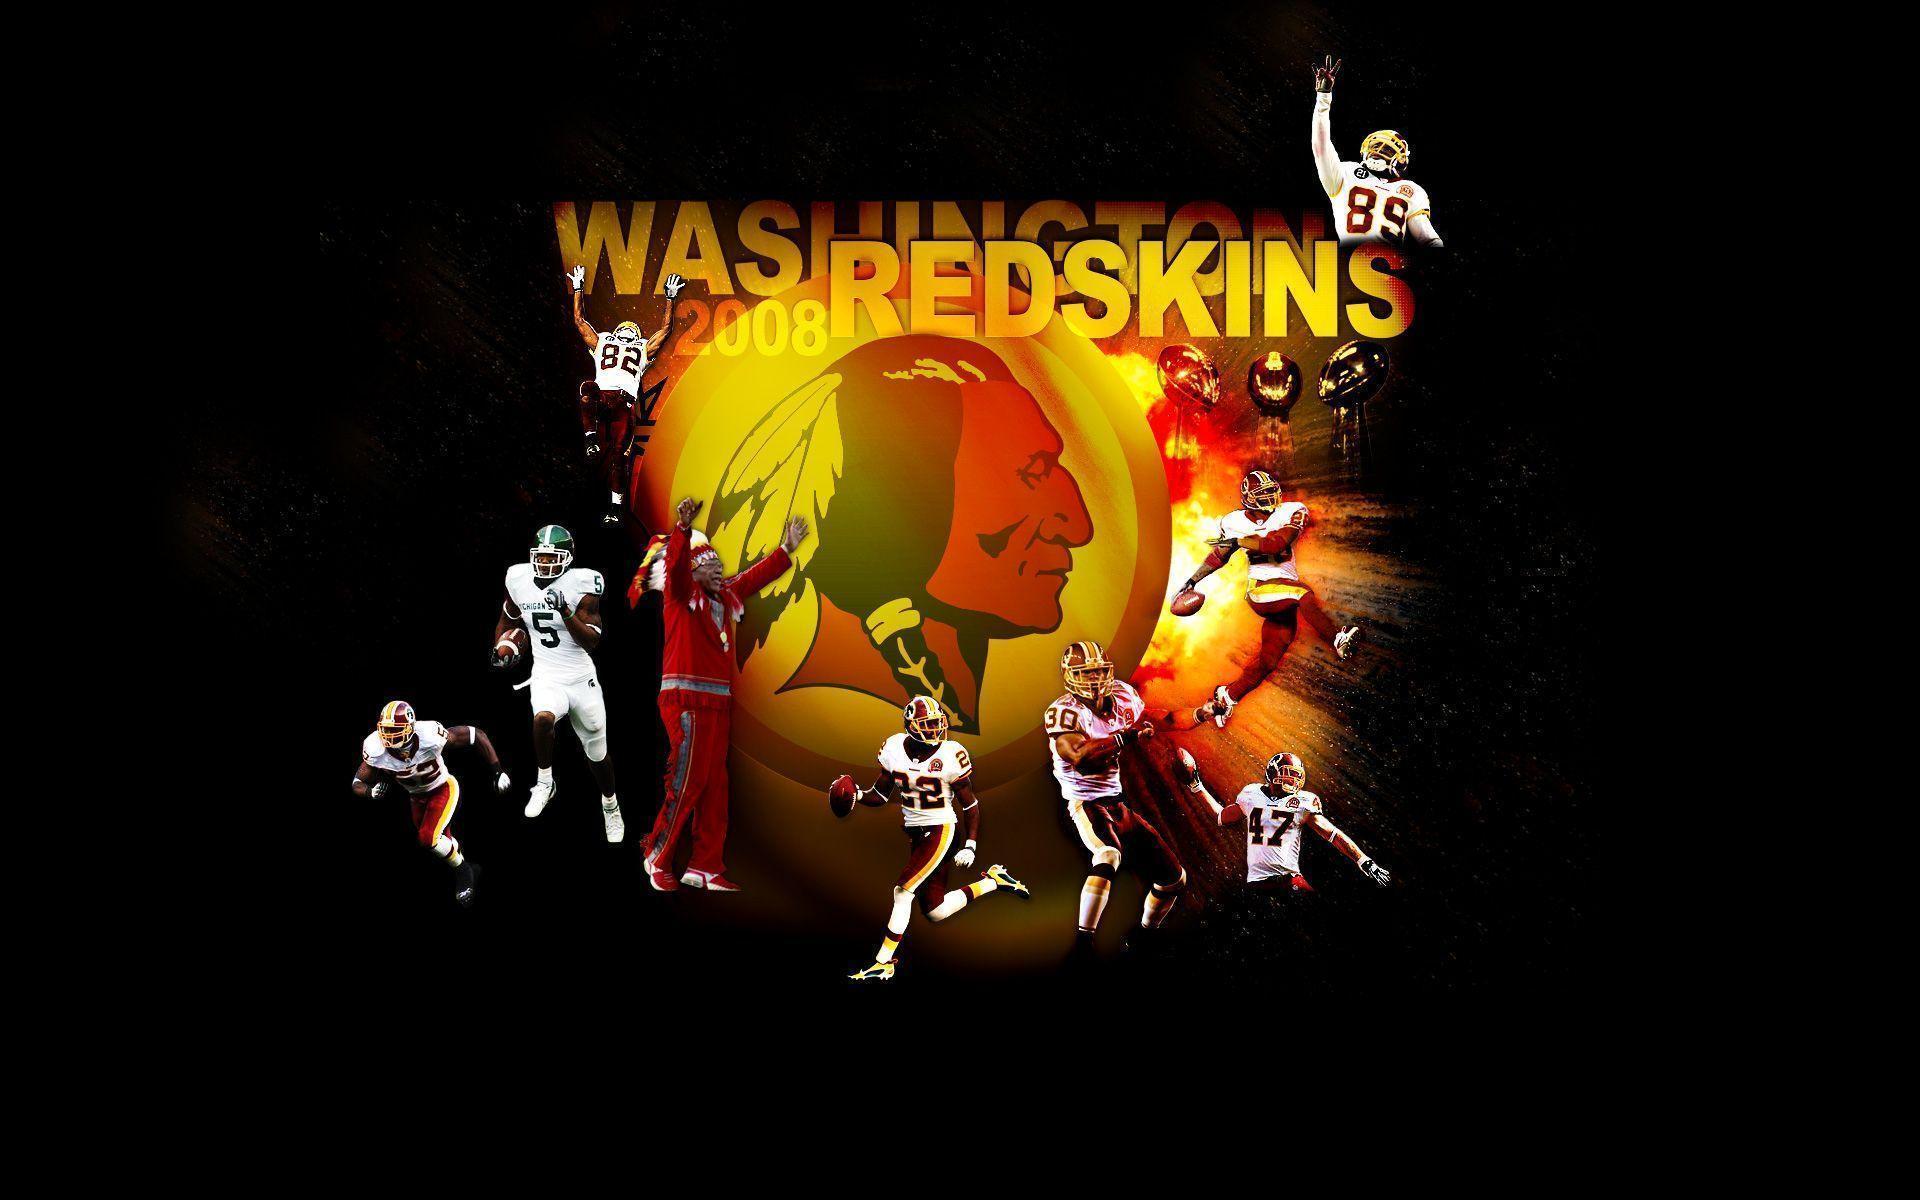 Redskins wallpapers 2017 wallpaper cave - Redskins wallpaper phone ...